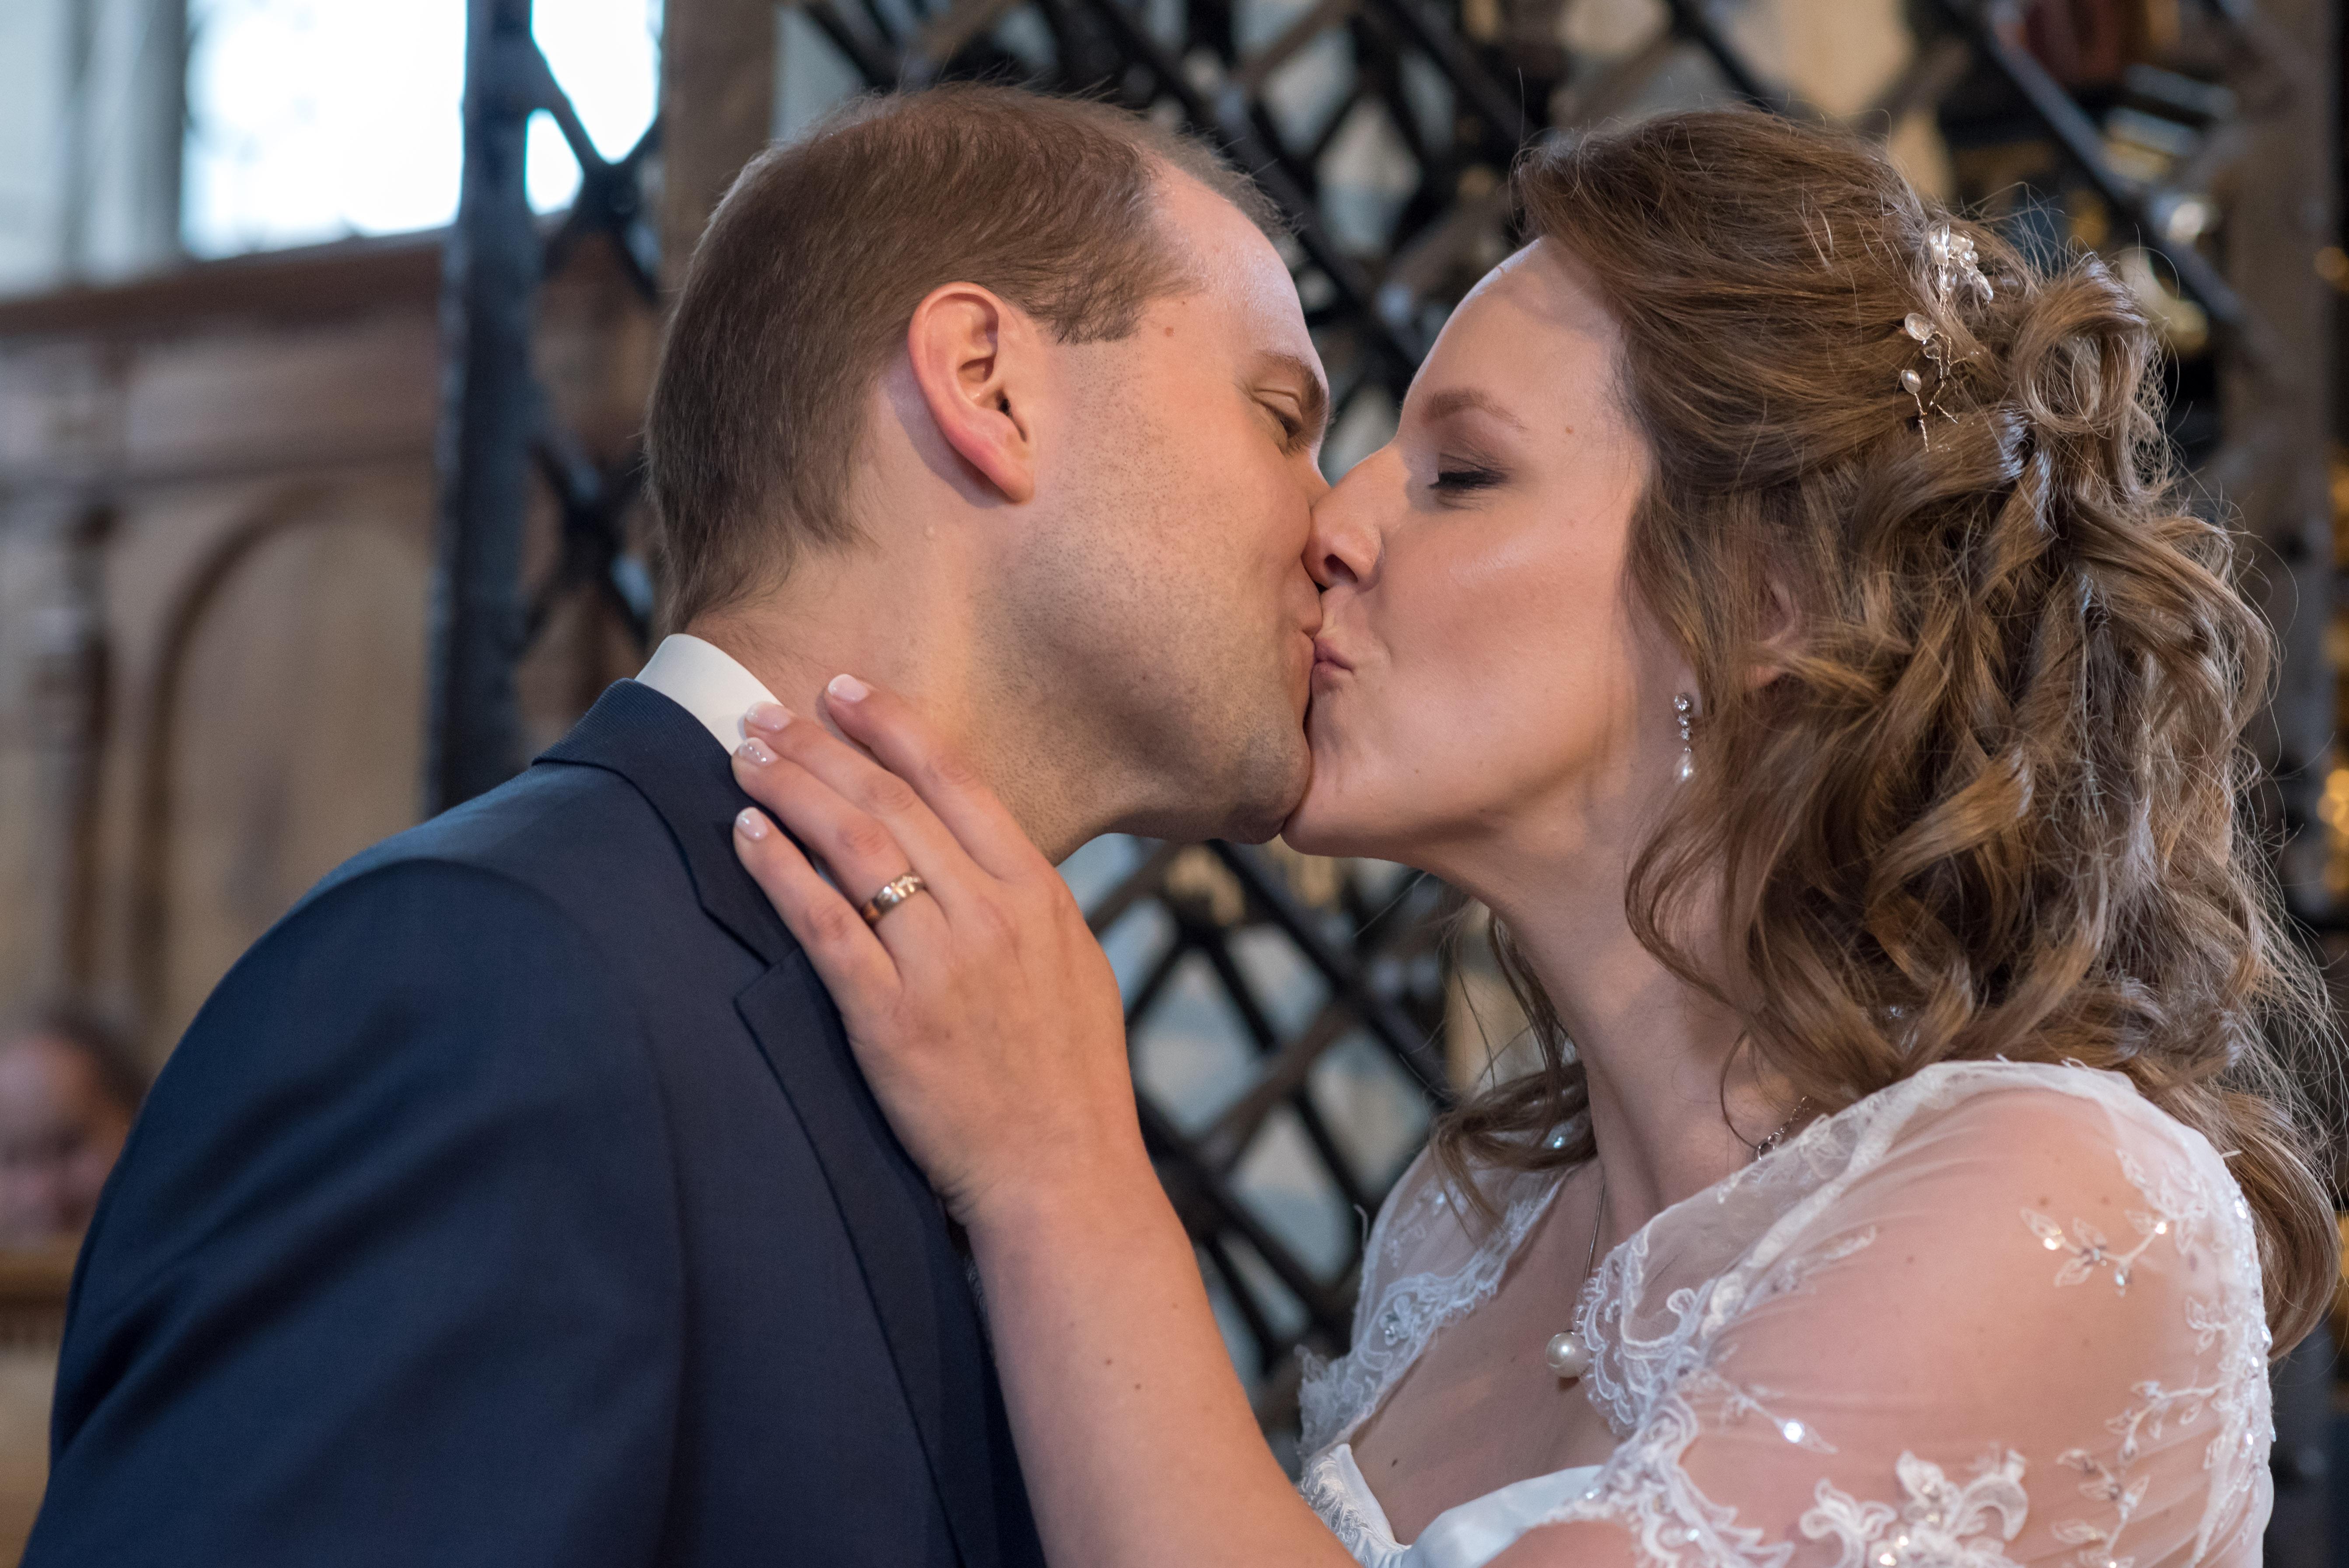 Ja-Wort, Kuss, Brautpaar, Hochzeit